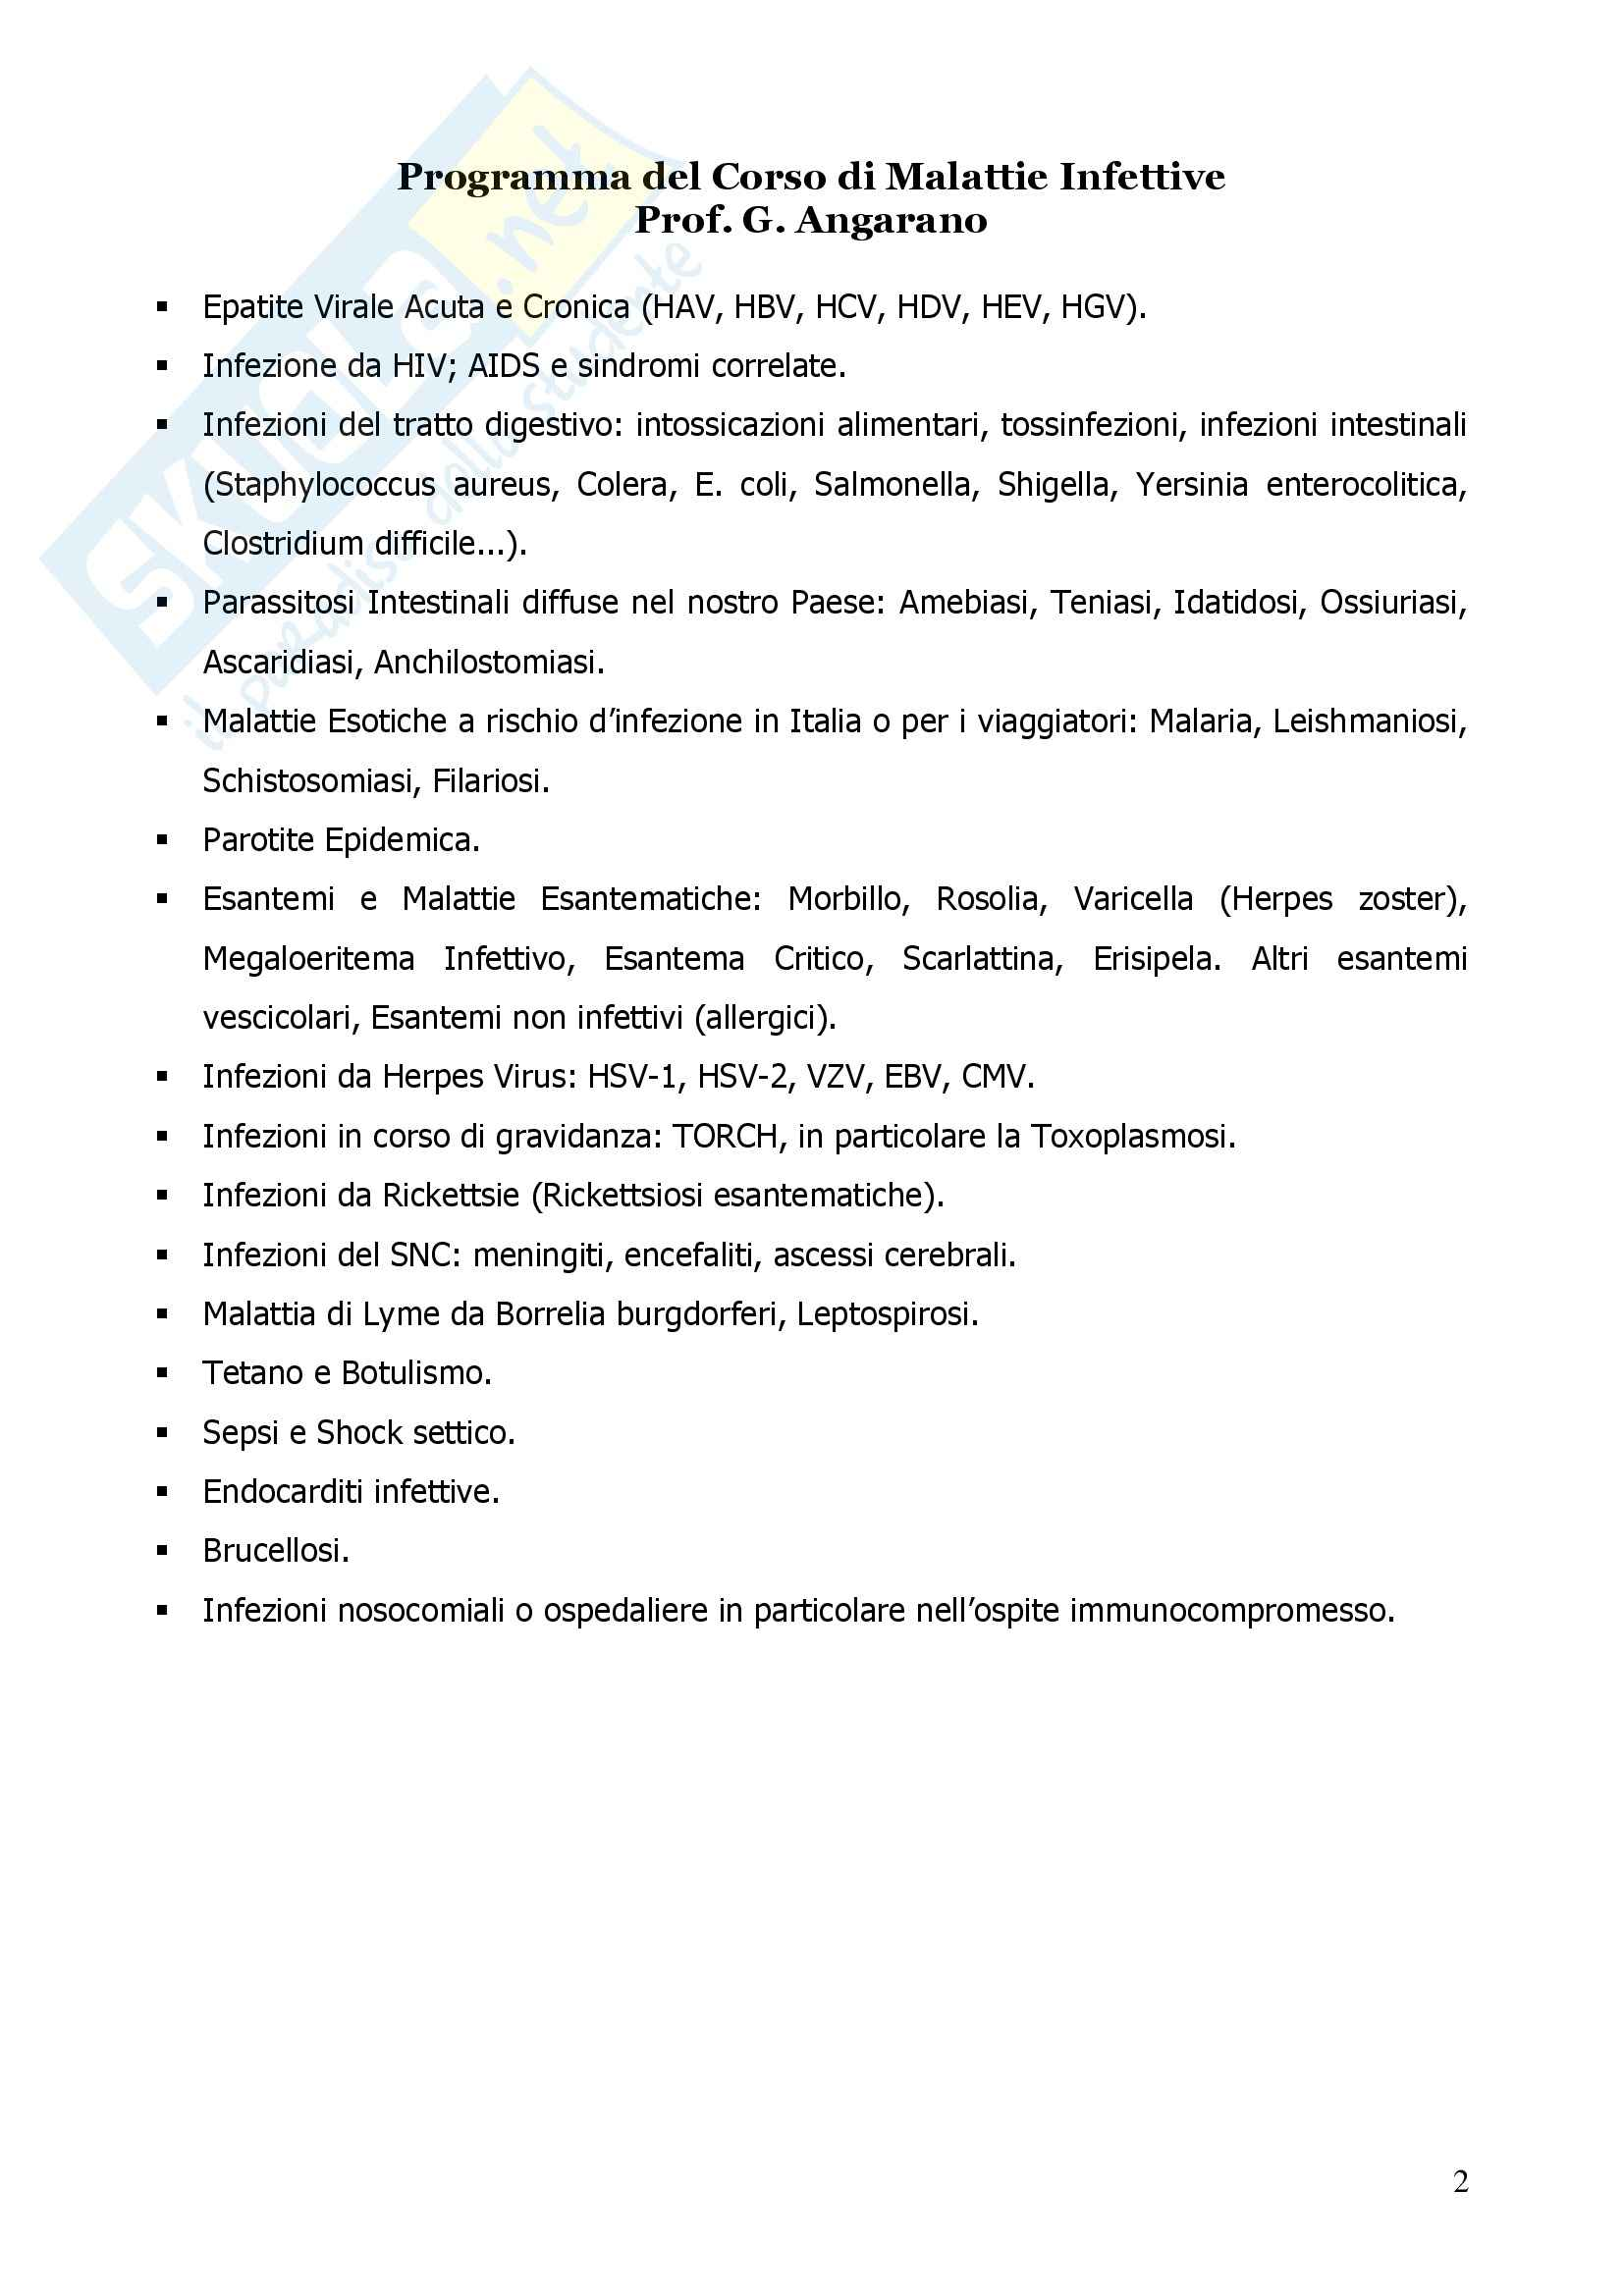 Malattie Infettive Pag. 2